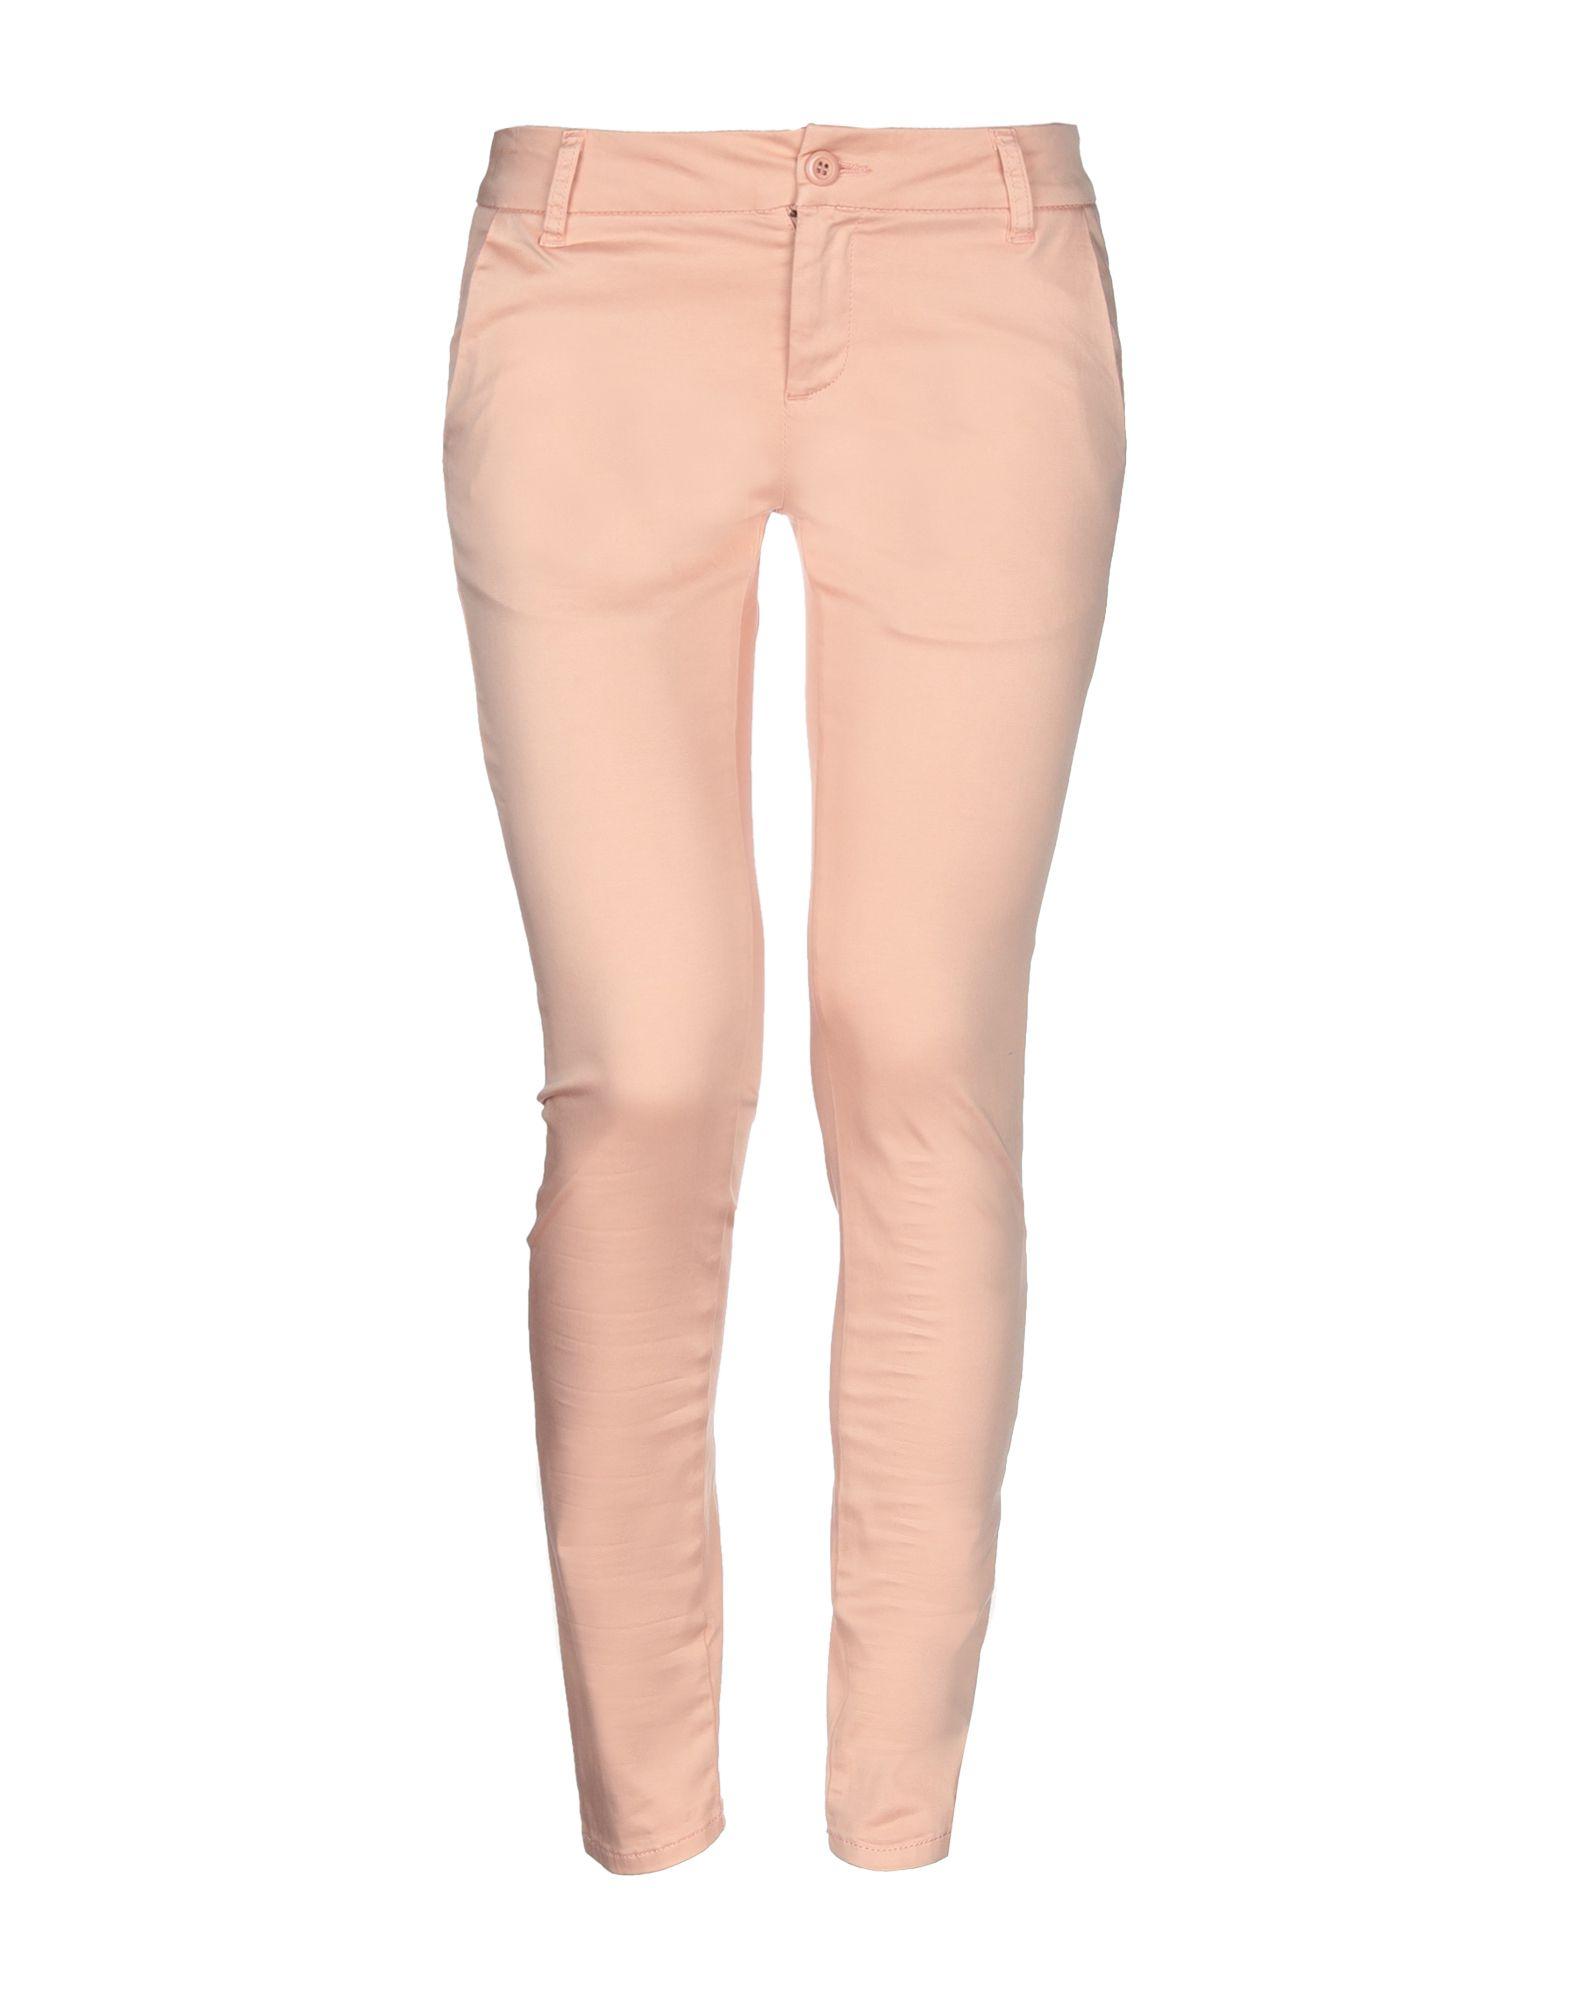 ATELIER FIXDESIGN Повседневные брюки atelier fixdesign повседневные брюки